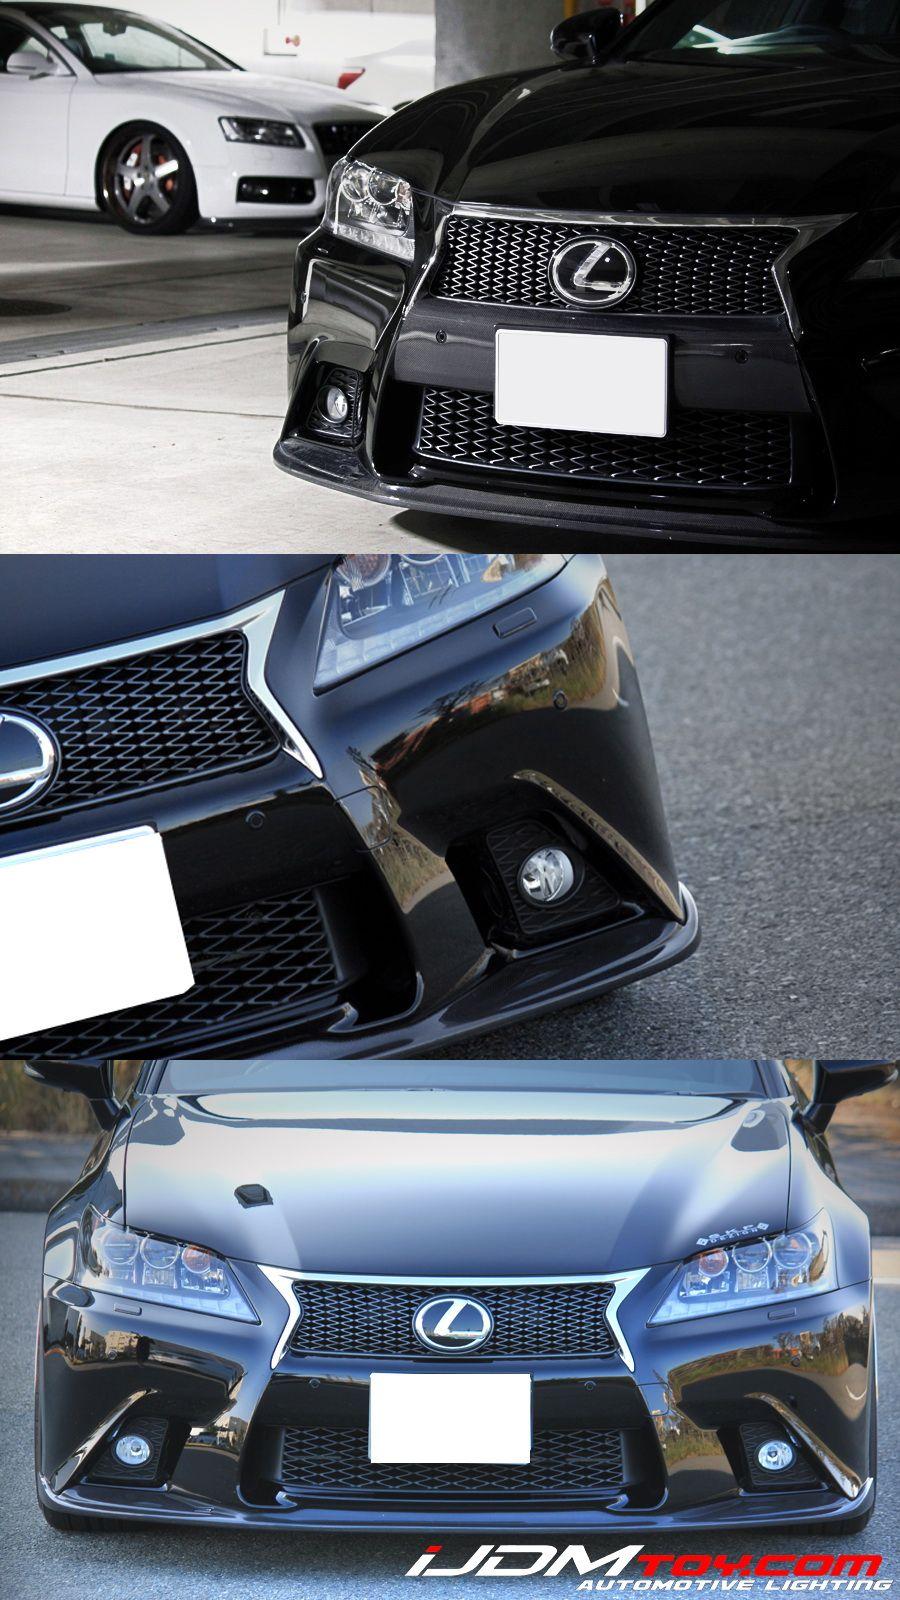 Complete Set Fog Lights W Jdm Gs F Foglamp Garnish Universal On Wiring New Ijdmtoy All Lexus Sport Light Kit Get Your Look More Genuine